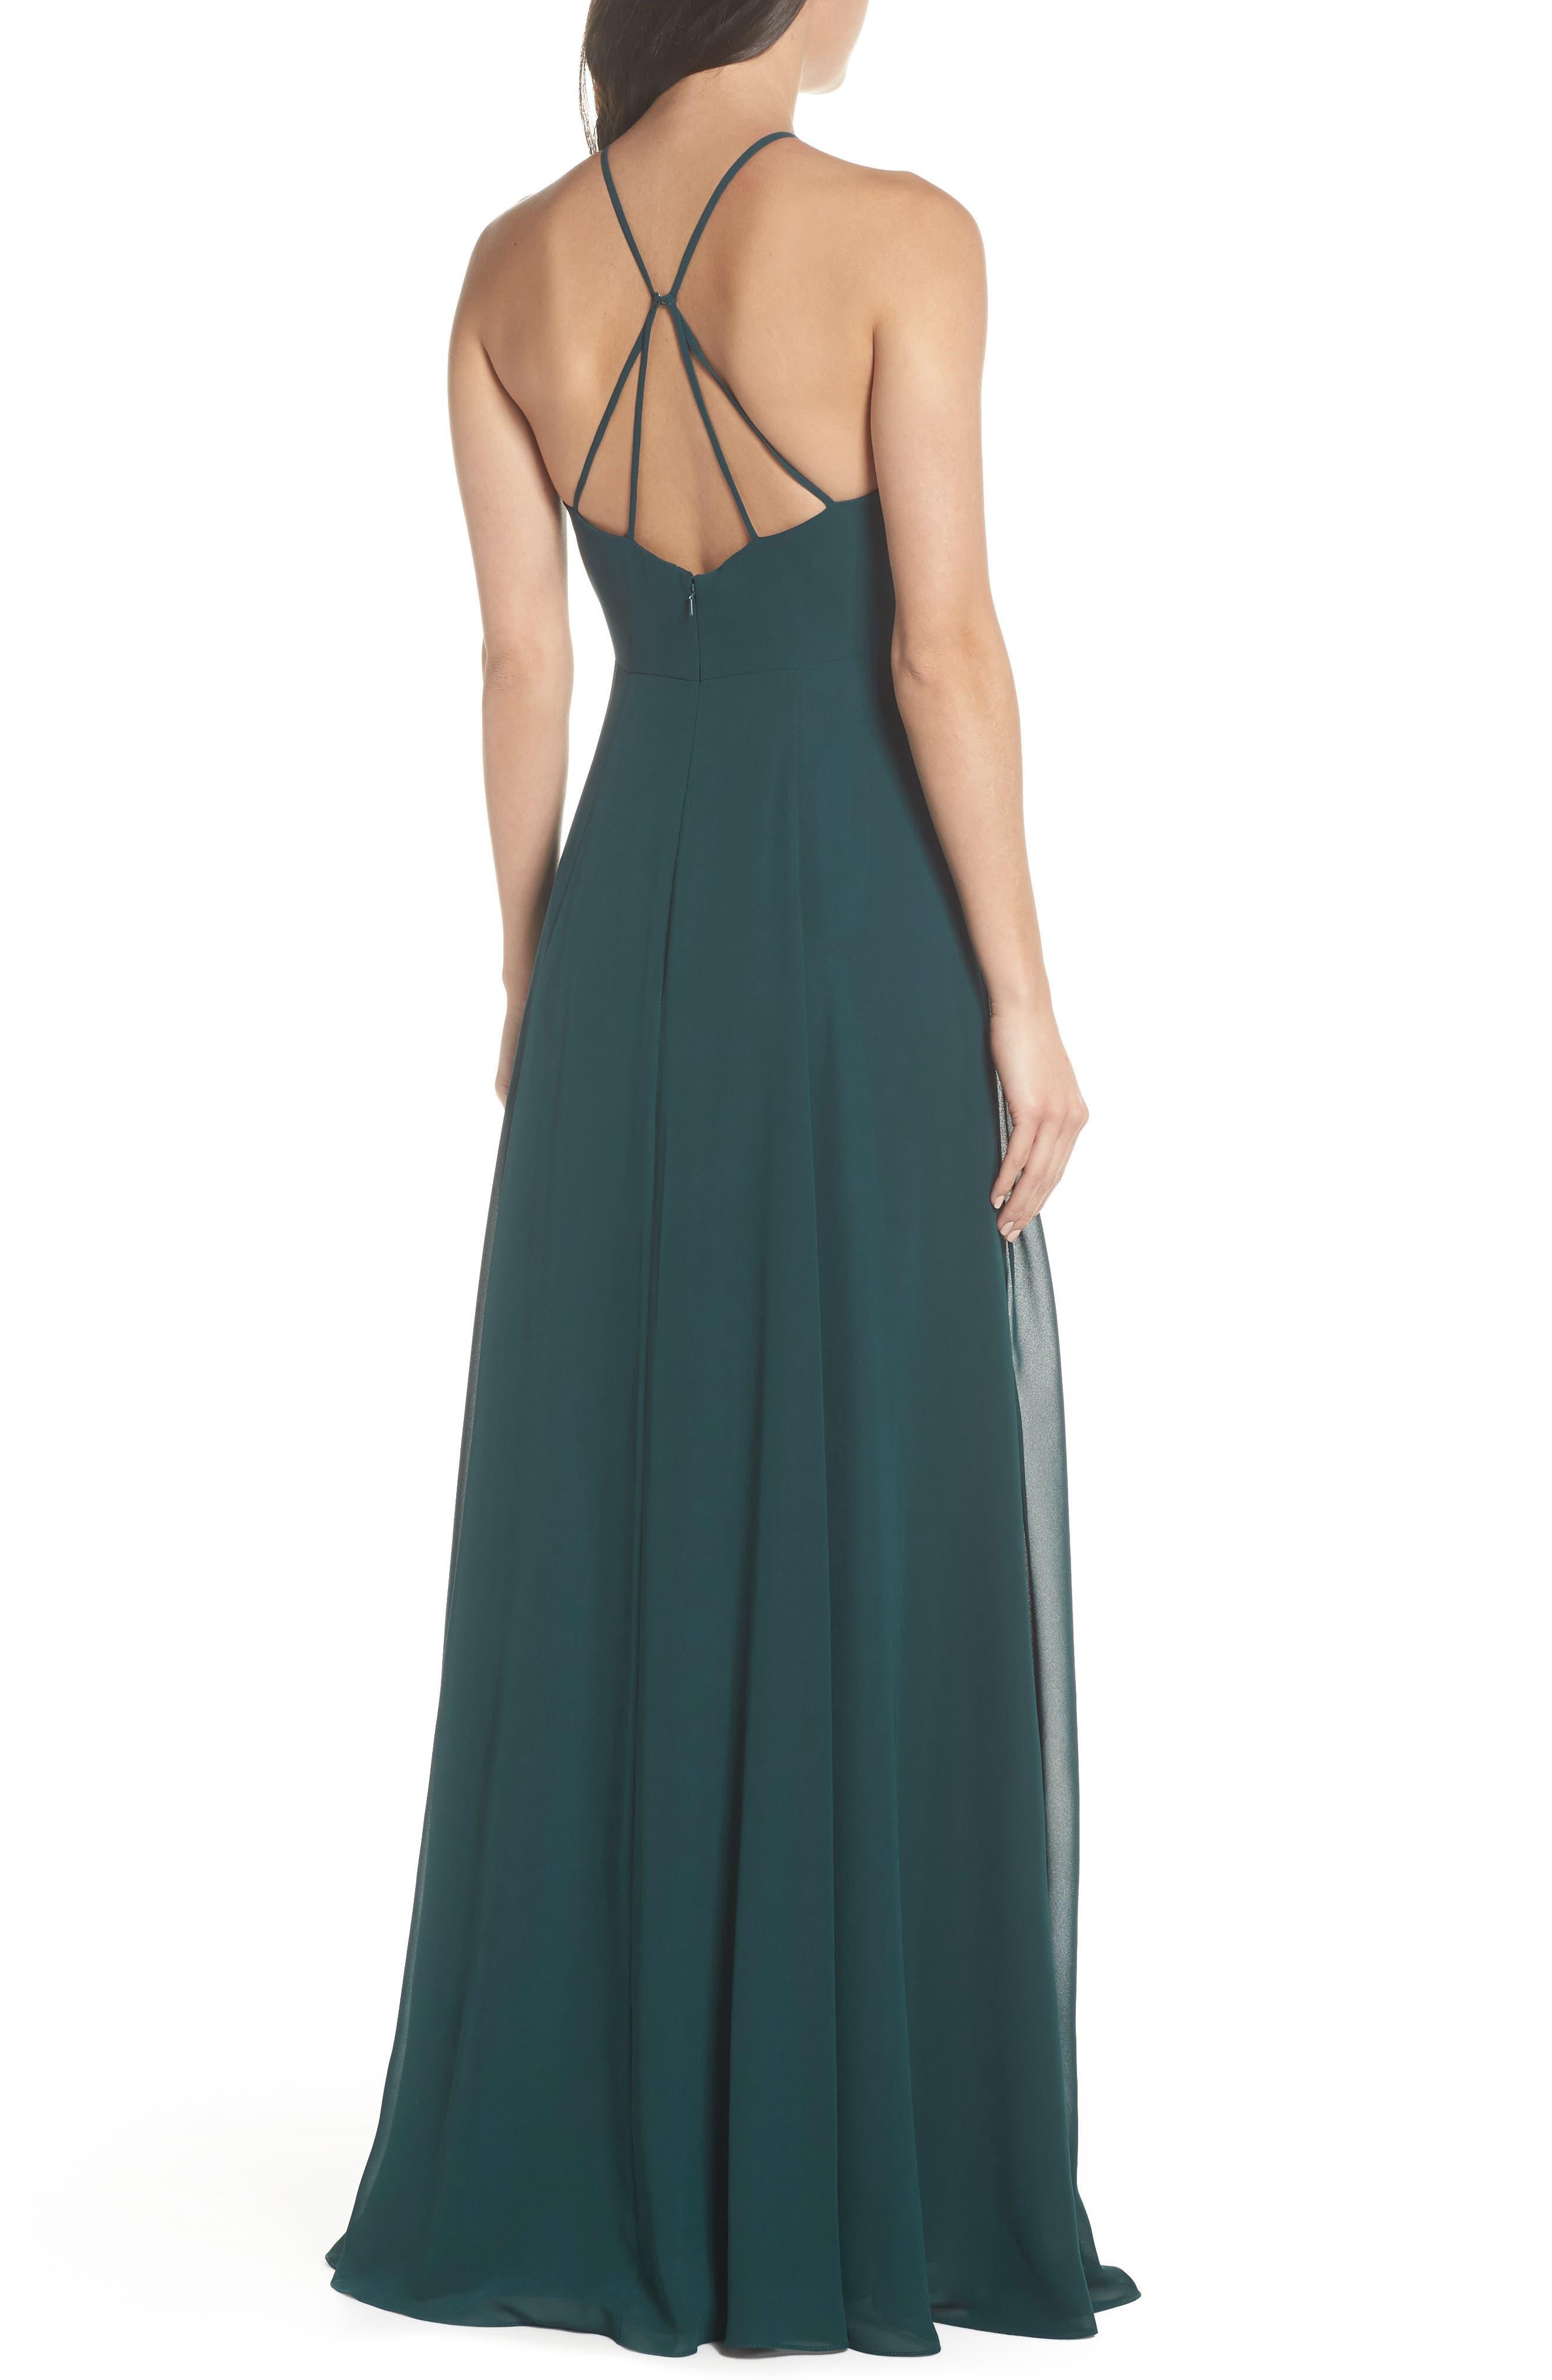 JENNY YOO, Kayla A-Line Halter Gown, Alternate thumbnail 2, color, CASPIAN SEA